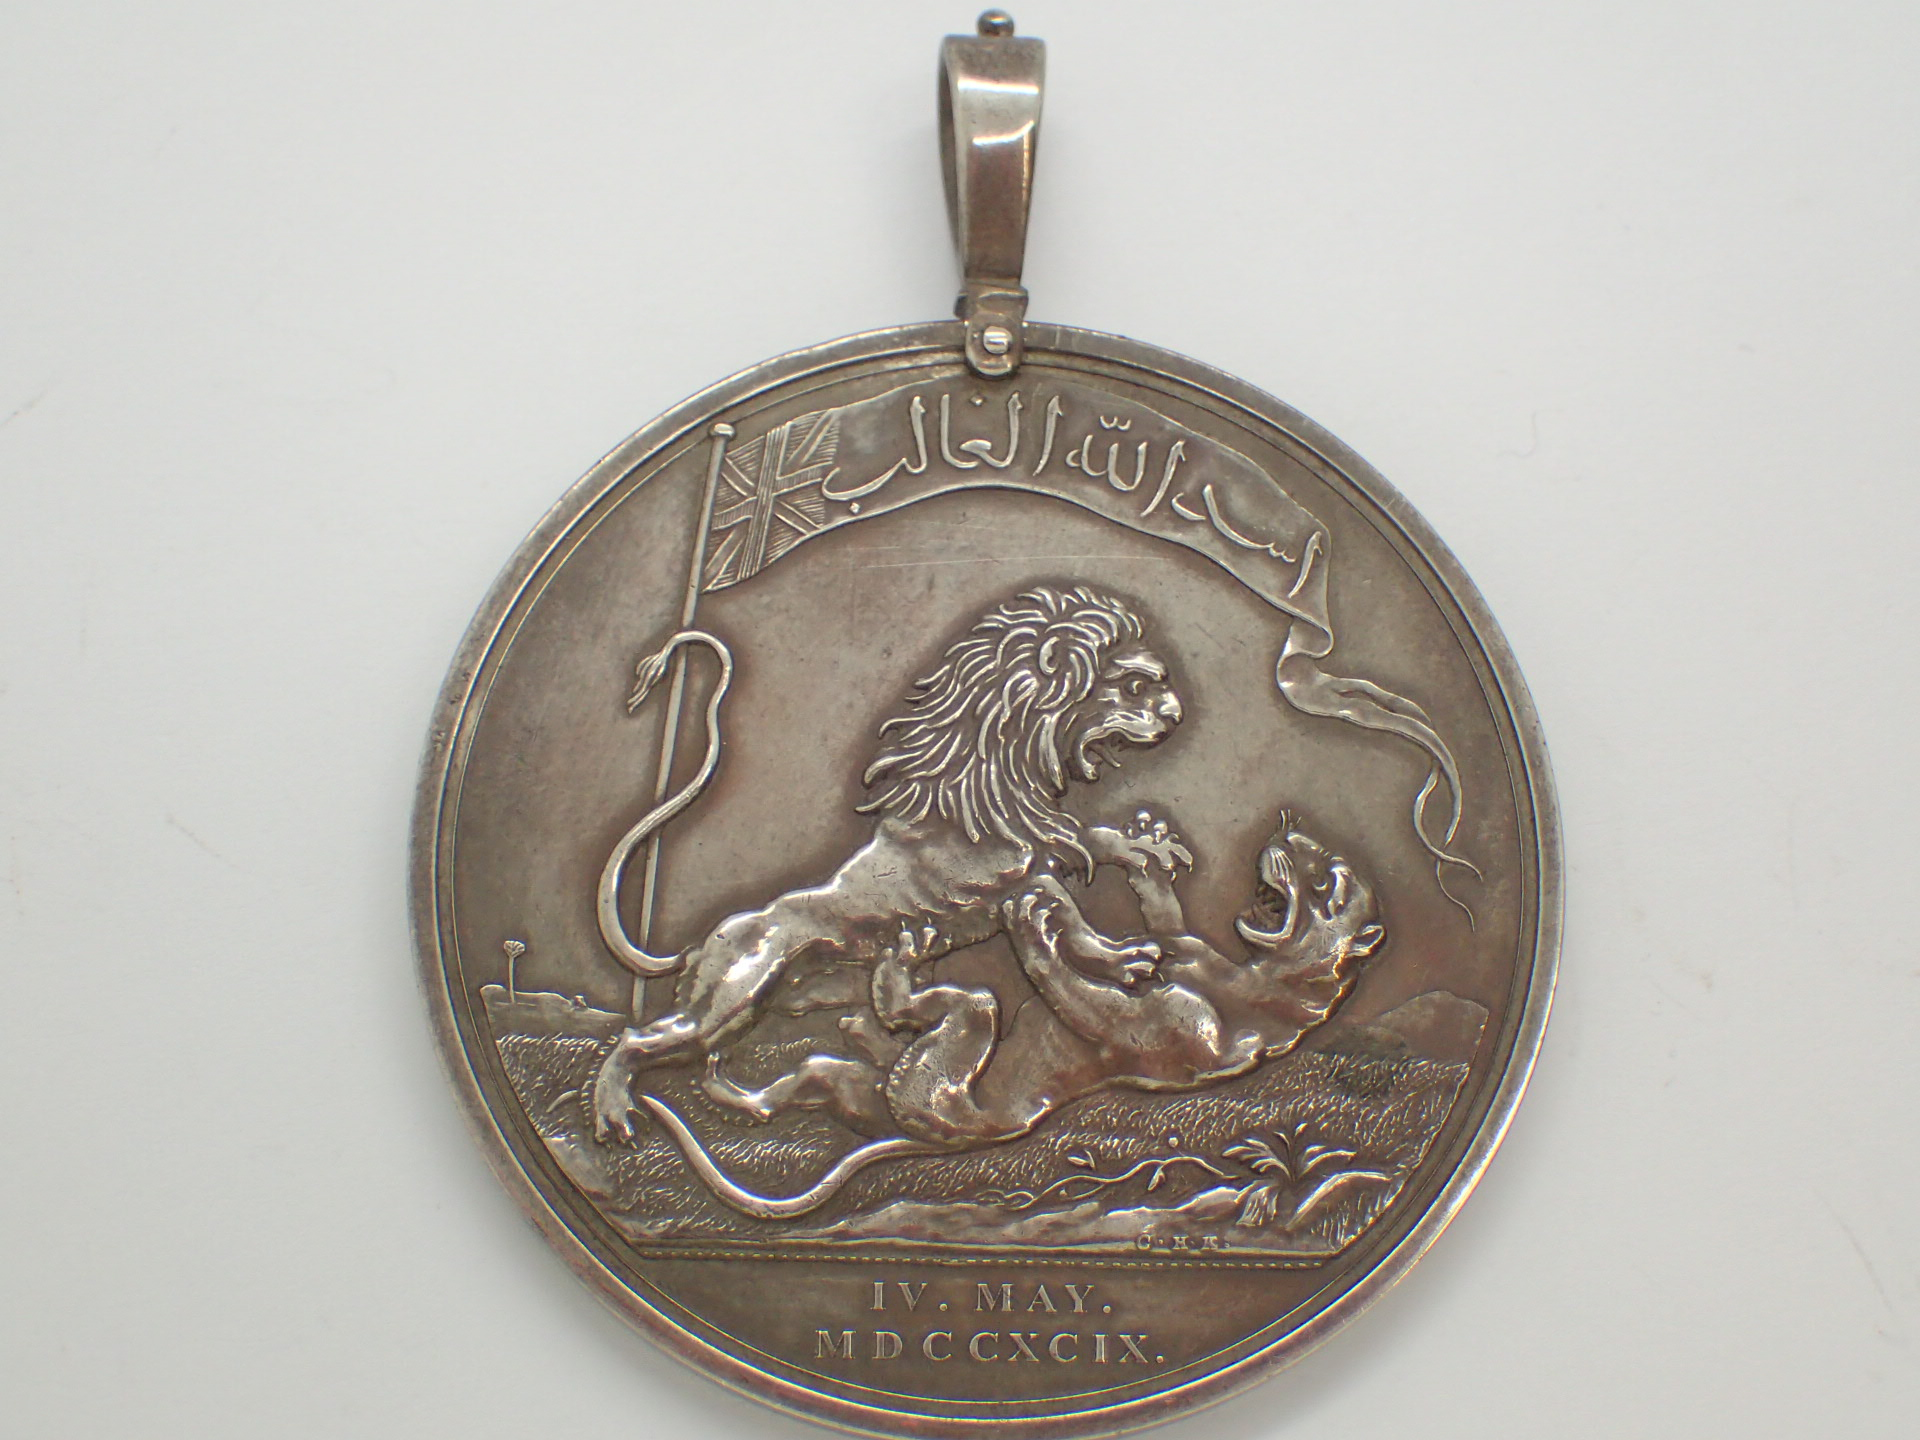 Lot 79 - 1799 Seringapatam silver medal awarded t